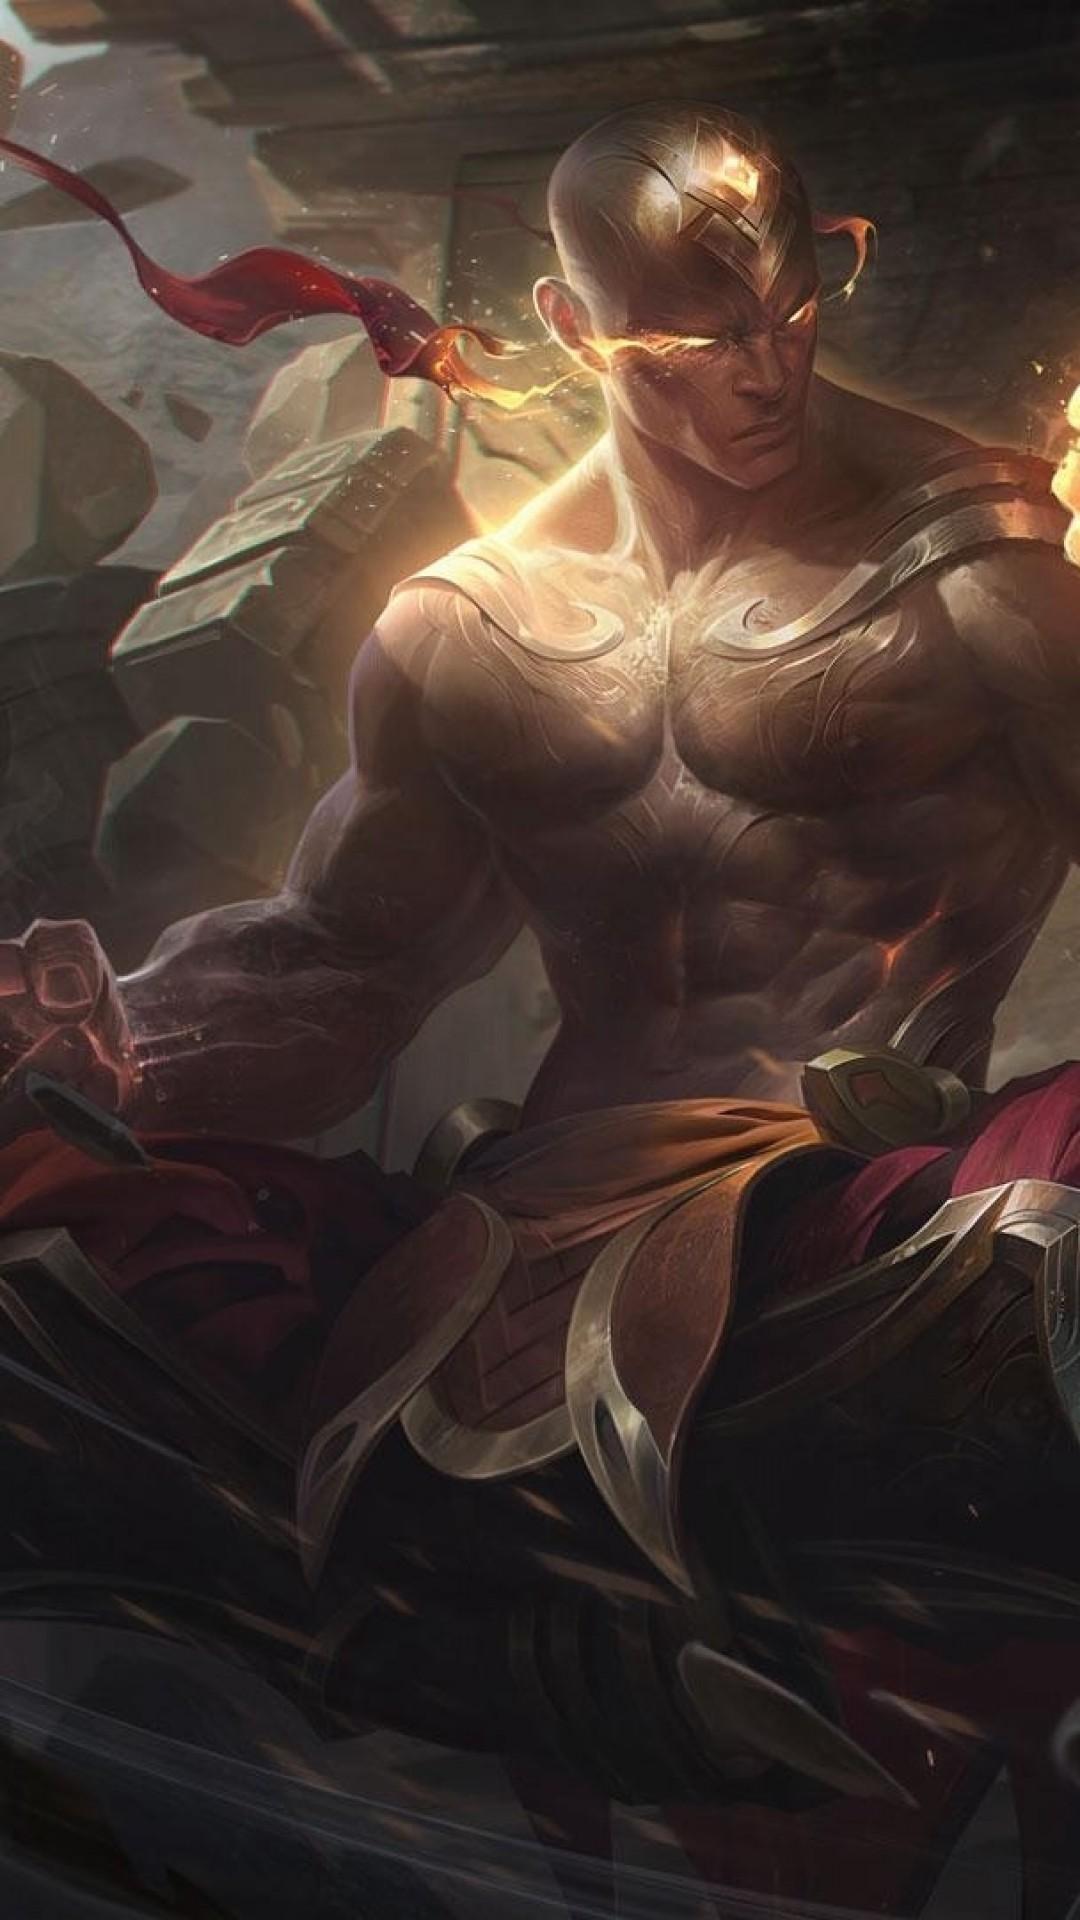 League Of Legends Lee Sin Artwork Fists Data Src Lee Sin